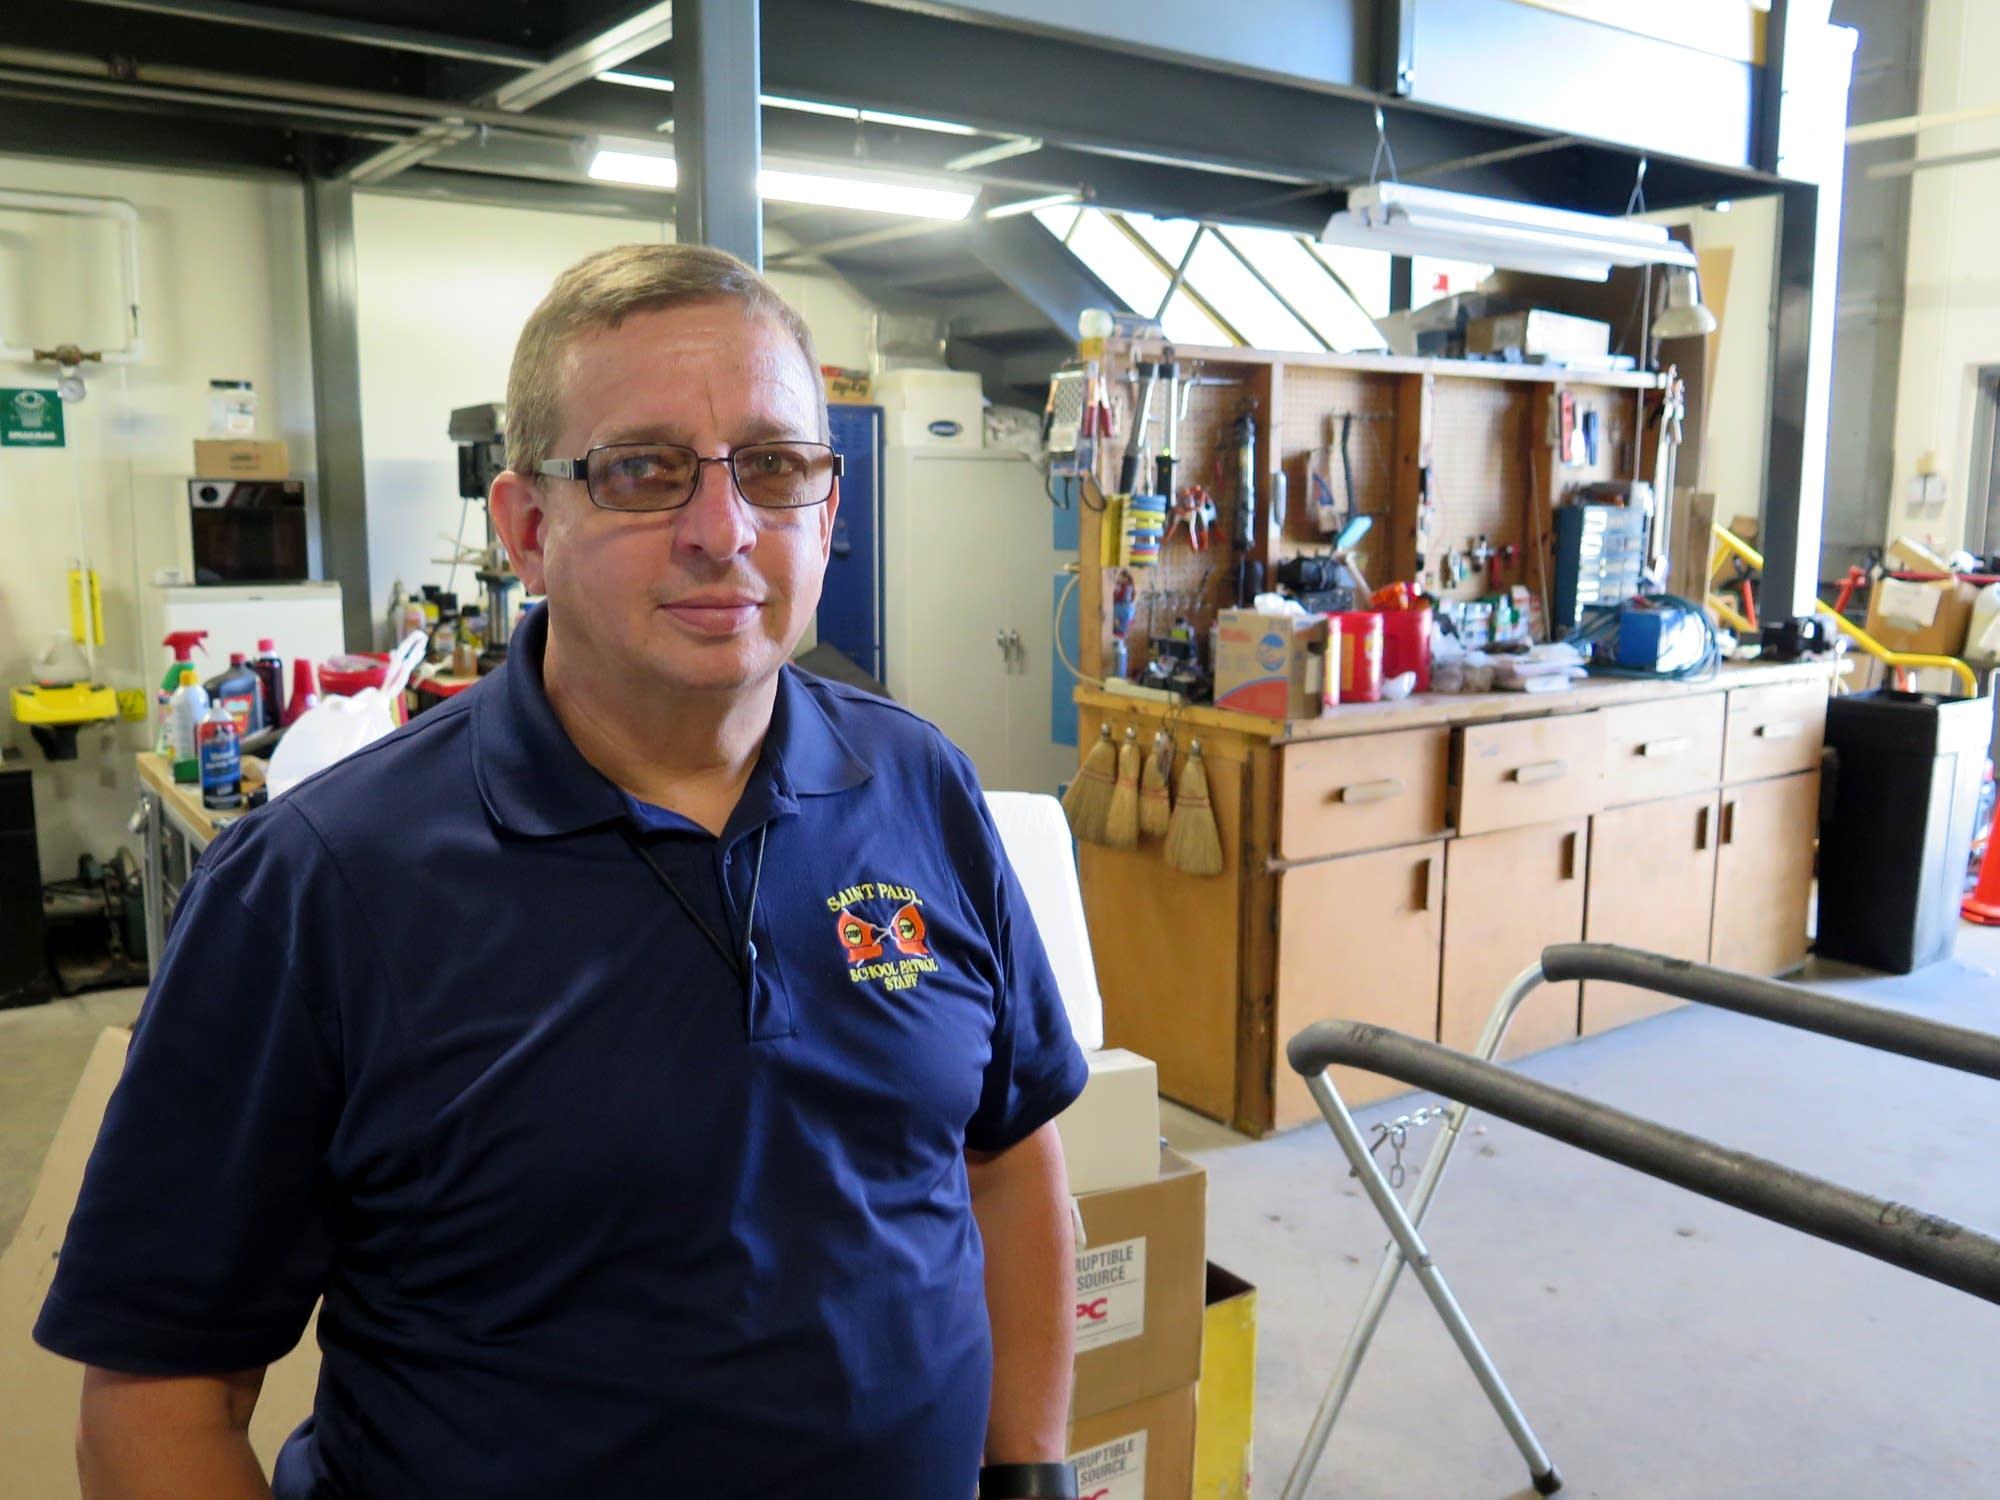 Dan Stroeing oversees maintenance of the transportation fleet